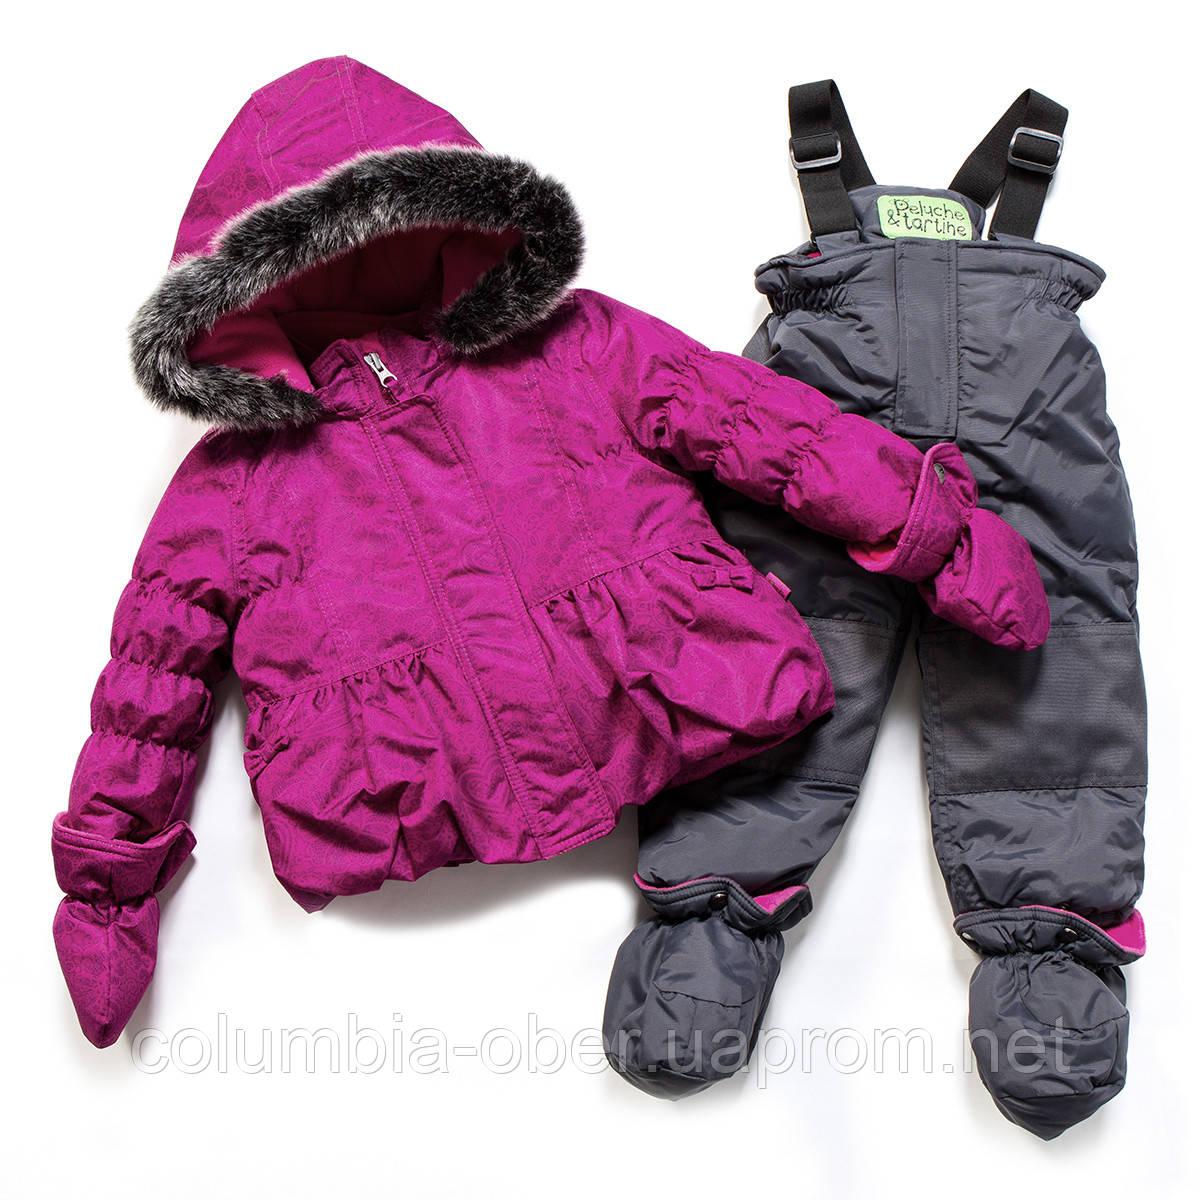 Зимний костюм для девочки PELUCHE F17 M 16 BF Magenta / Smokey Grey. Размер 24 мес.